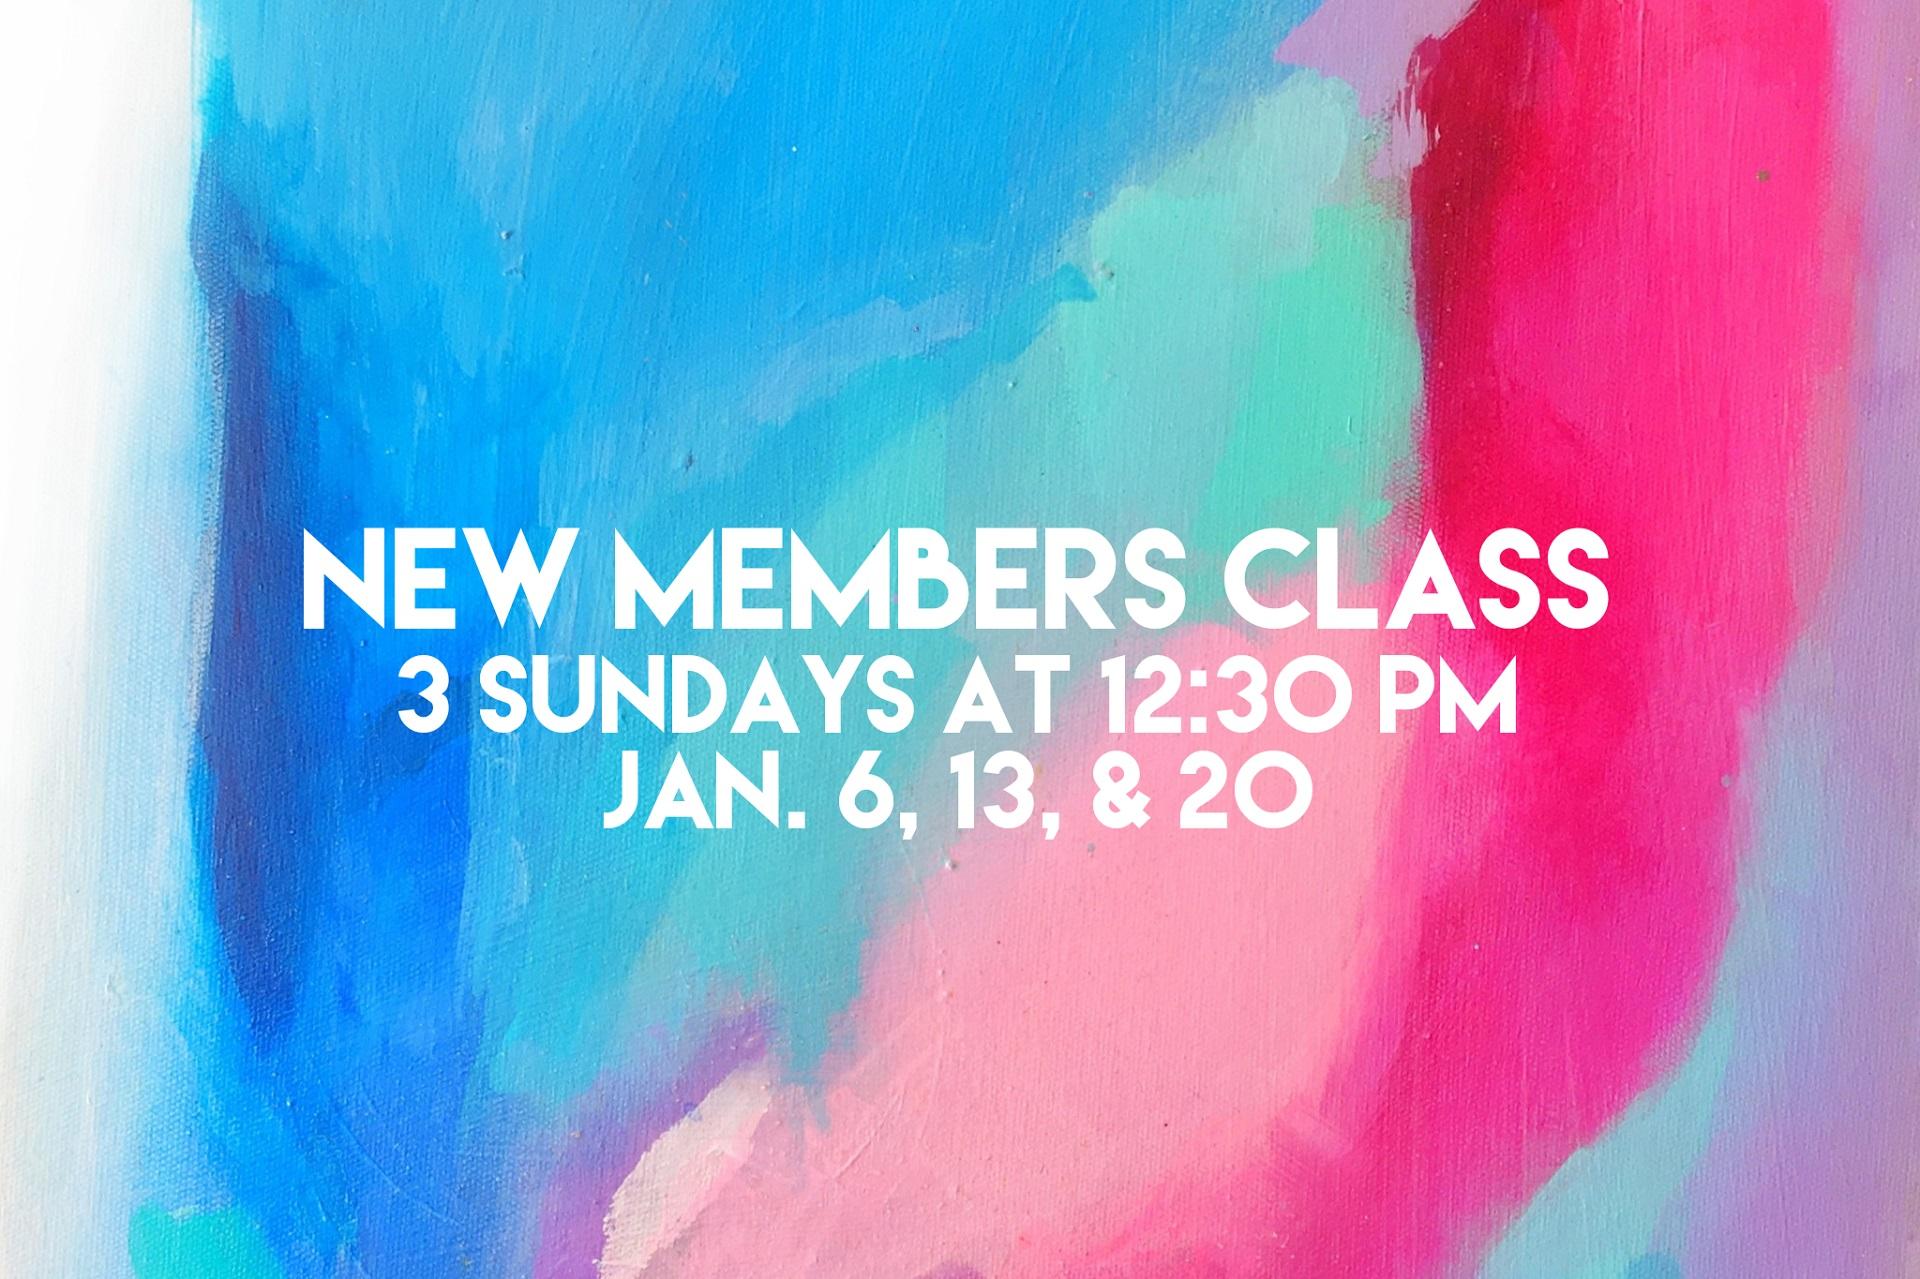 New Members Class.jpg